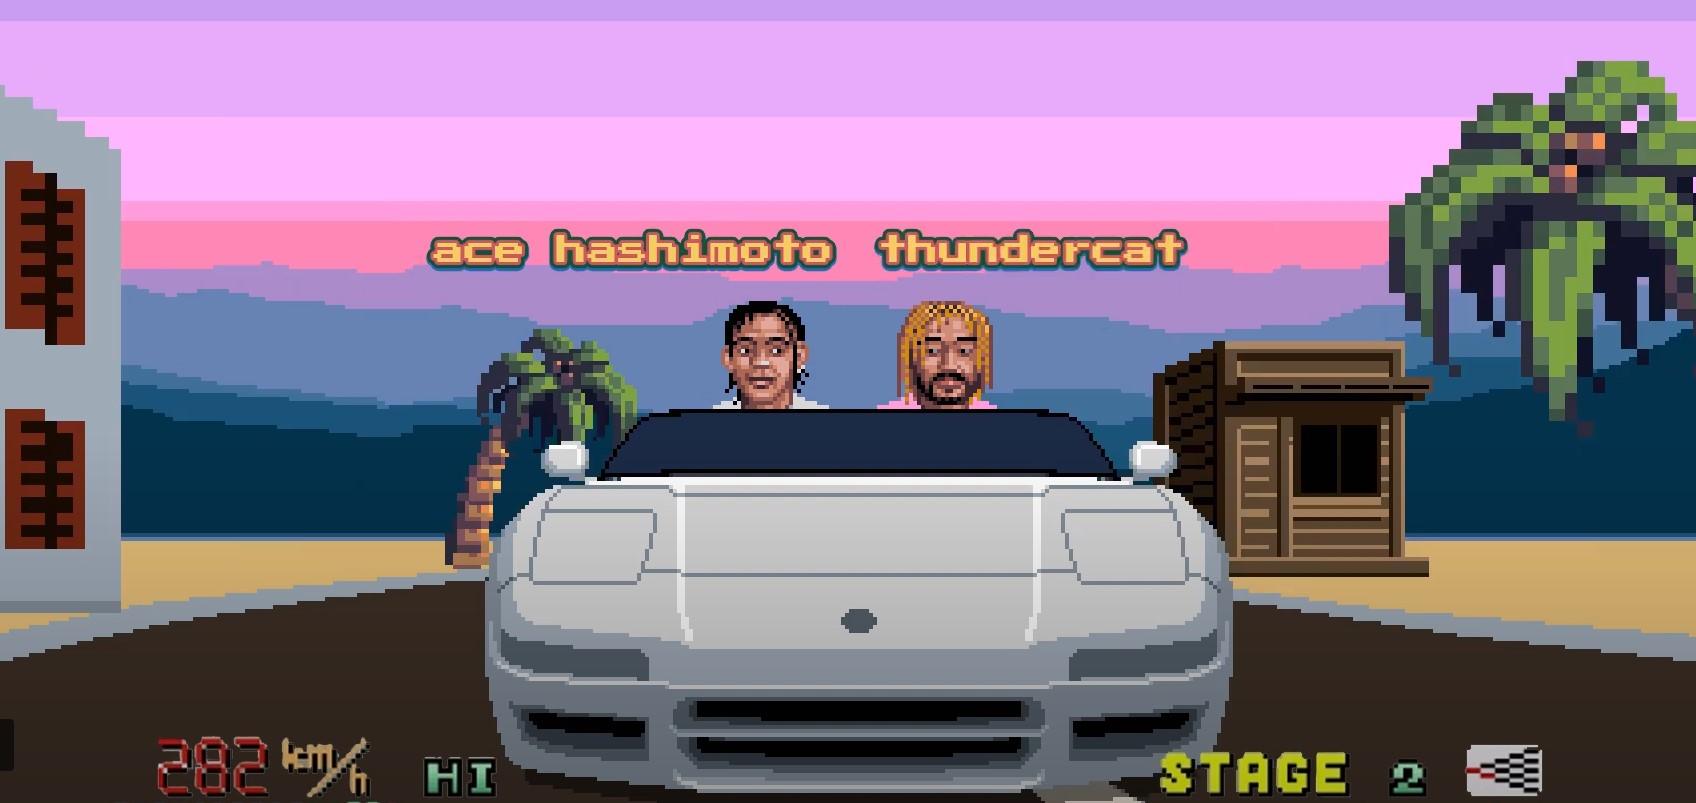 Thundercat y Ace Hashimoto comparten Vaporwaves